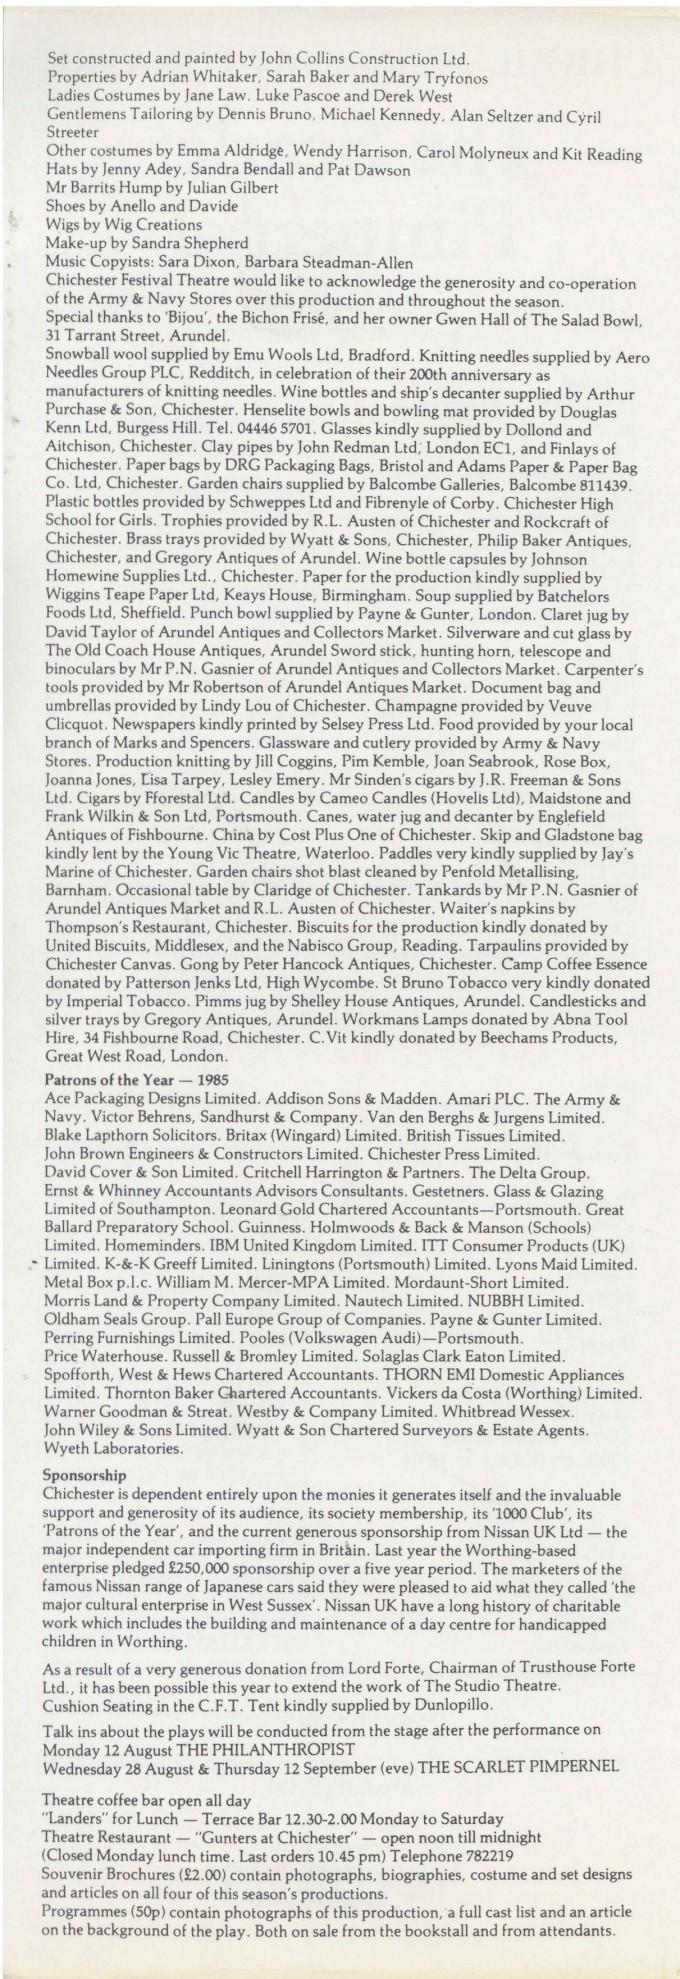 Cast List - The Scarlet Pimpernel - 1985 - 2 of 2